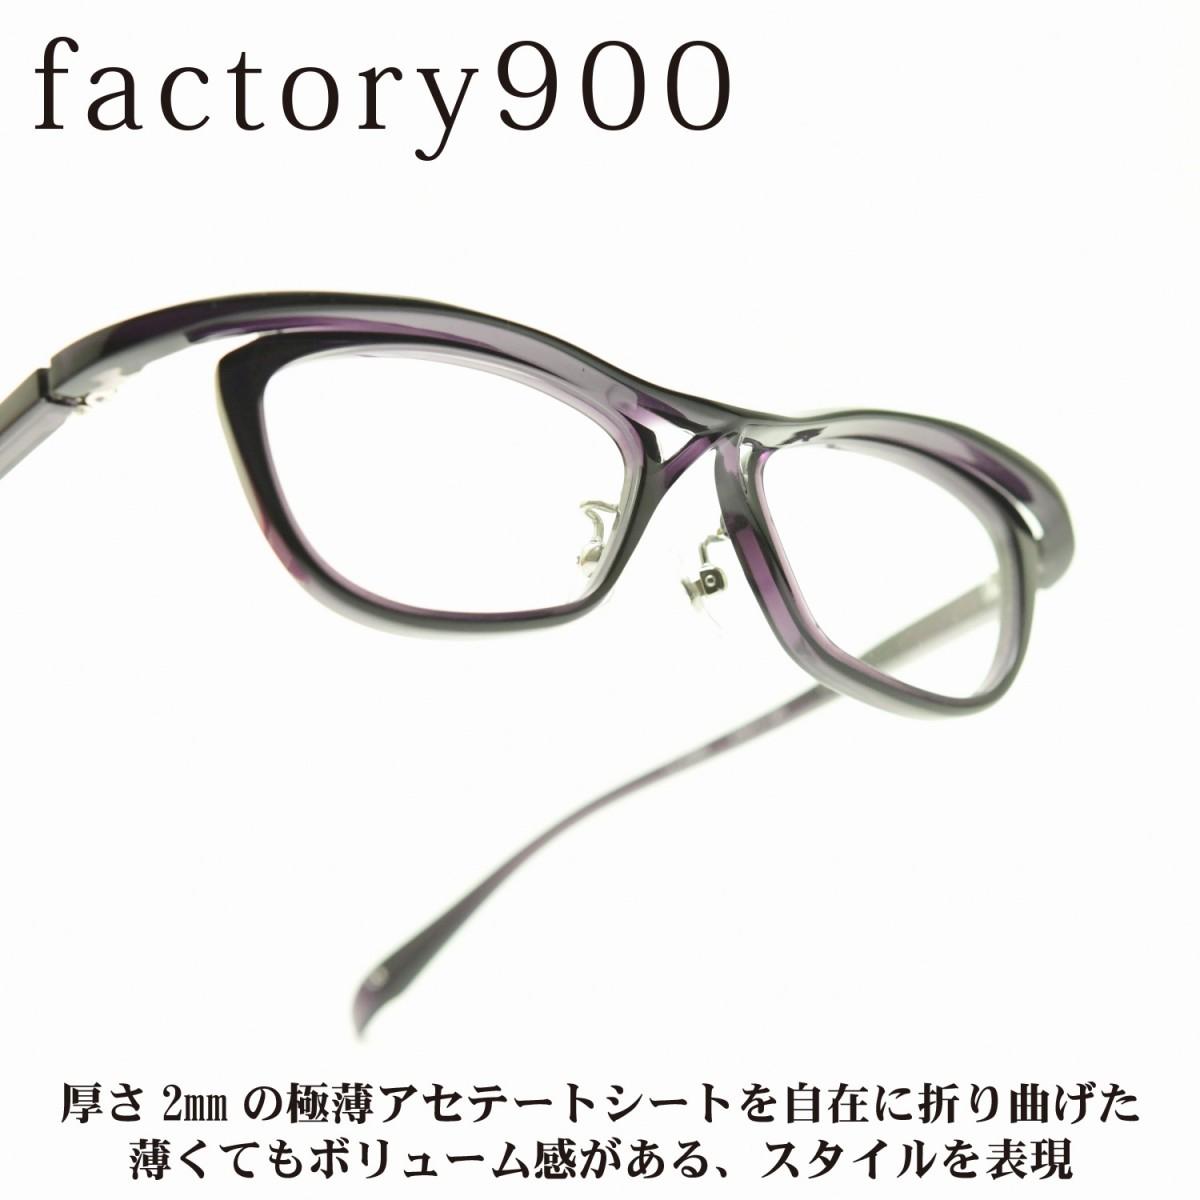 factory900 ファクトリー900FA-2032 col-035